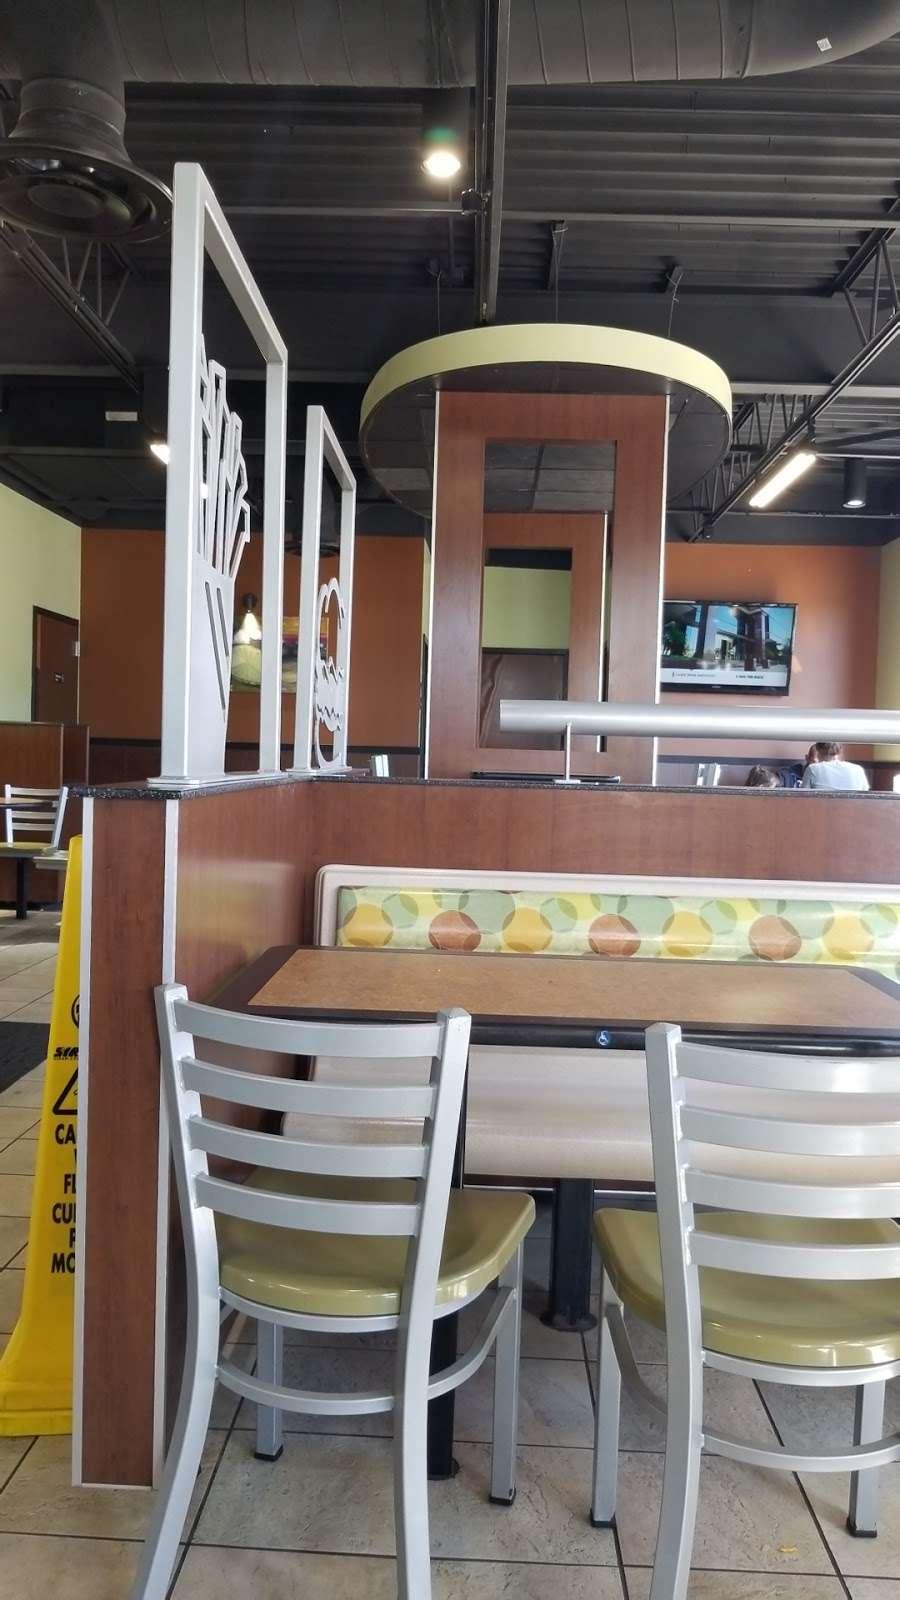 Burger King - restaurant    Photo 6 of 10   Address: 490 US-46, South Hackensack, NJ 07606, USA   Phone: (201) 641-5534